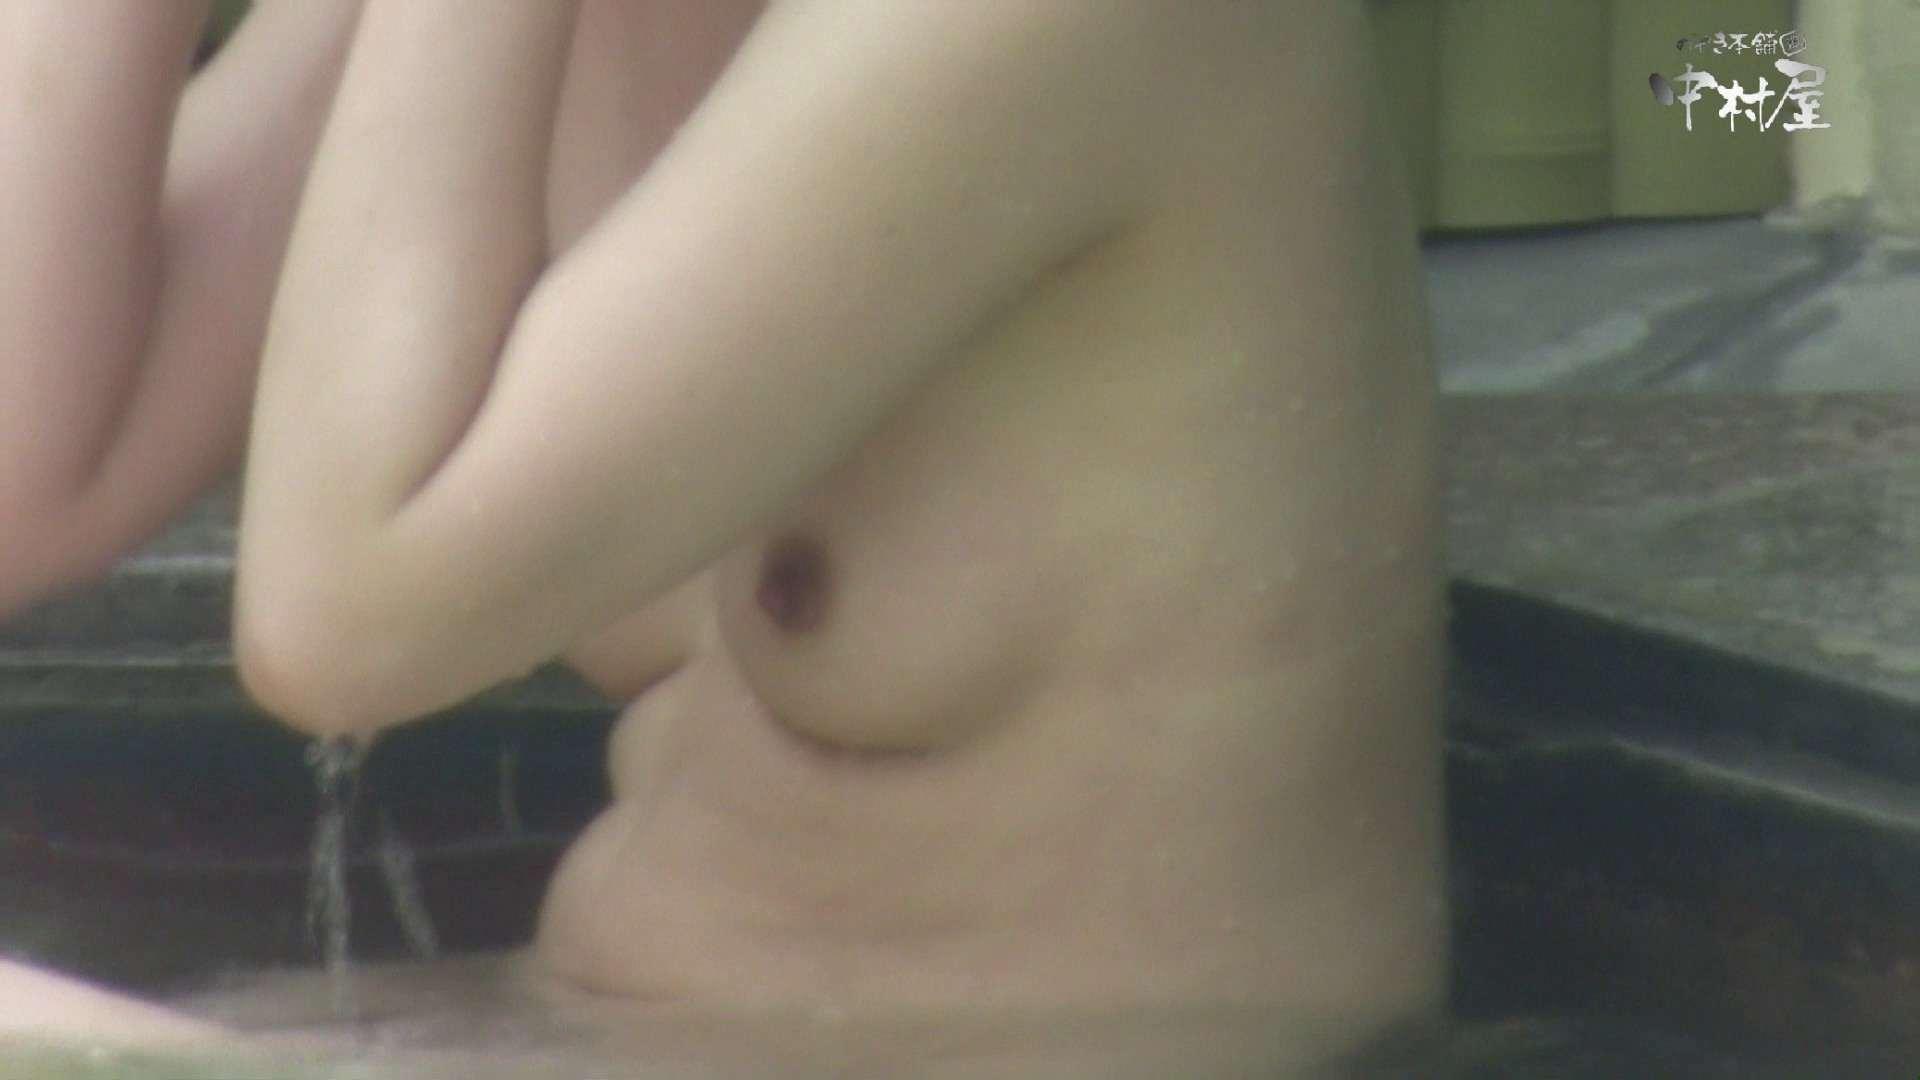 Aquaな露天風呂Vol.888 盗撮 エロ無料画像 77画像 17